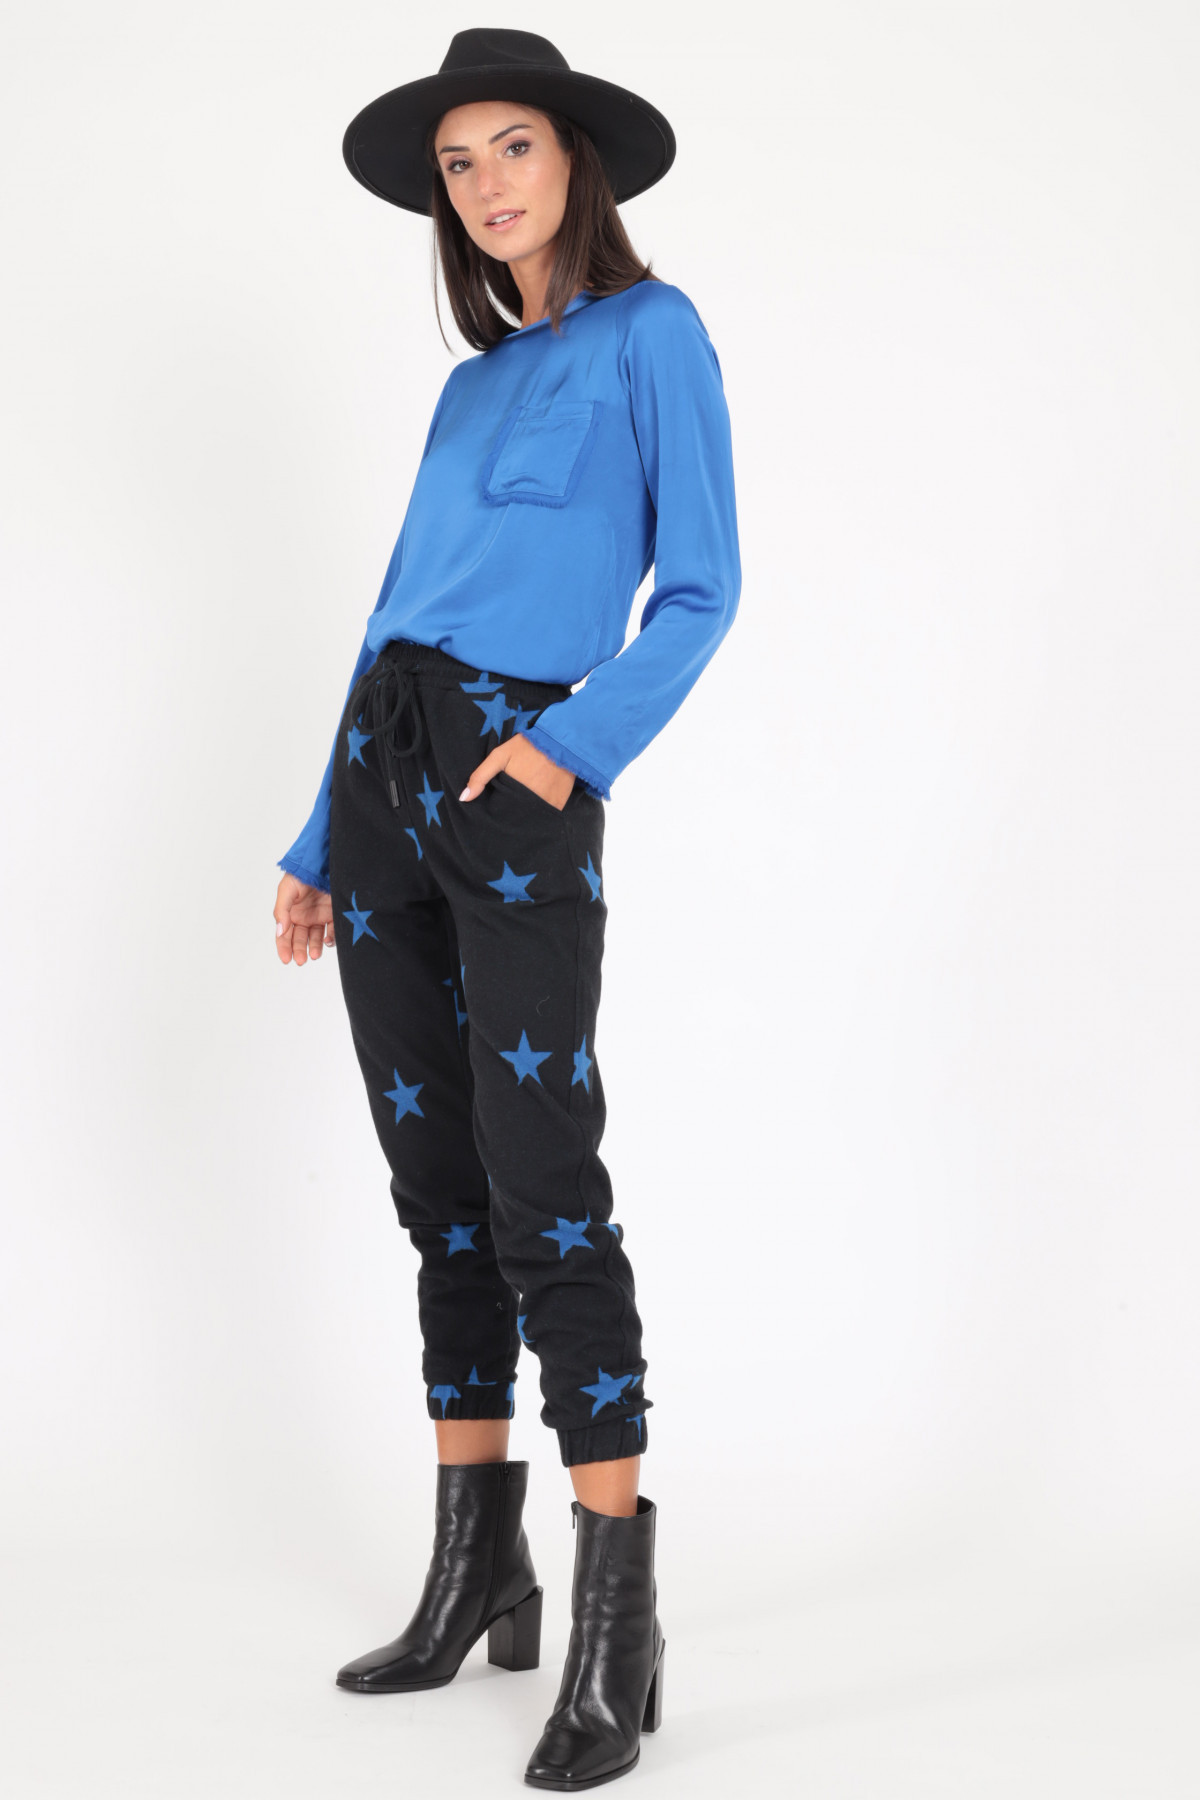 Pantaloni Stile Jogger in Stampa Fantasia Stella